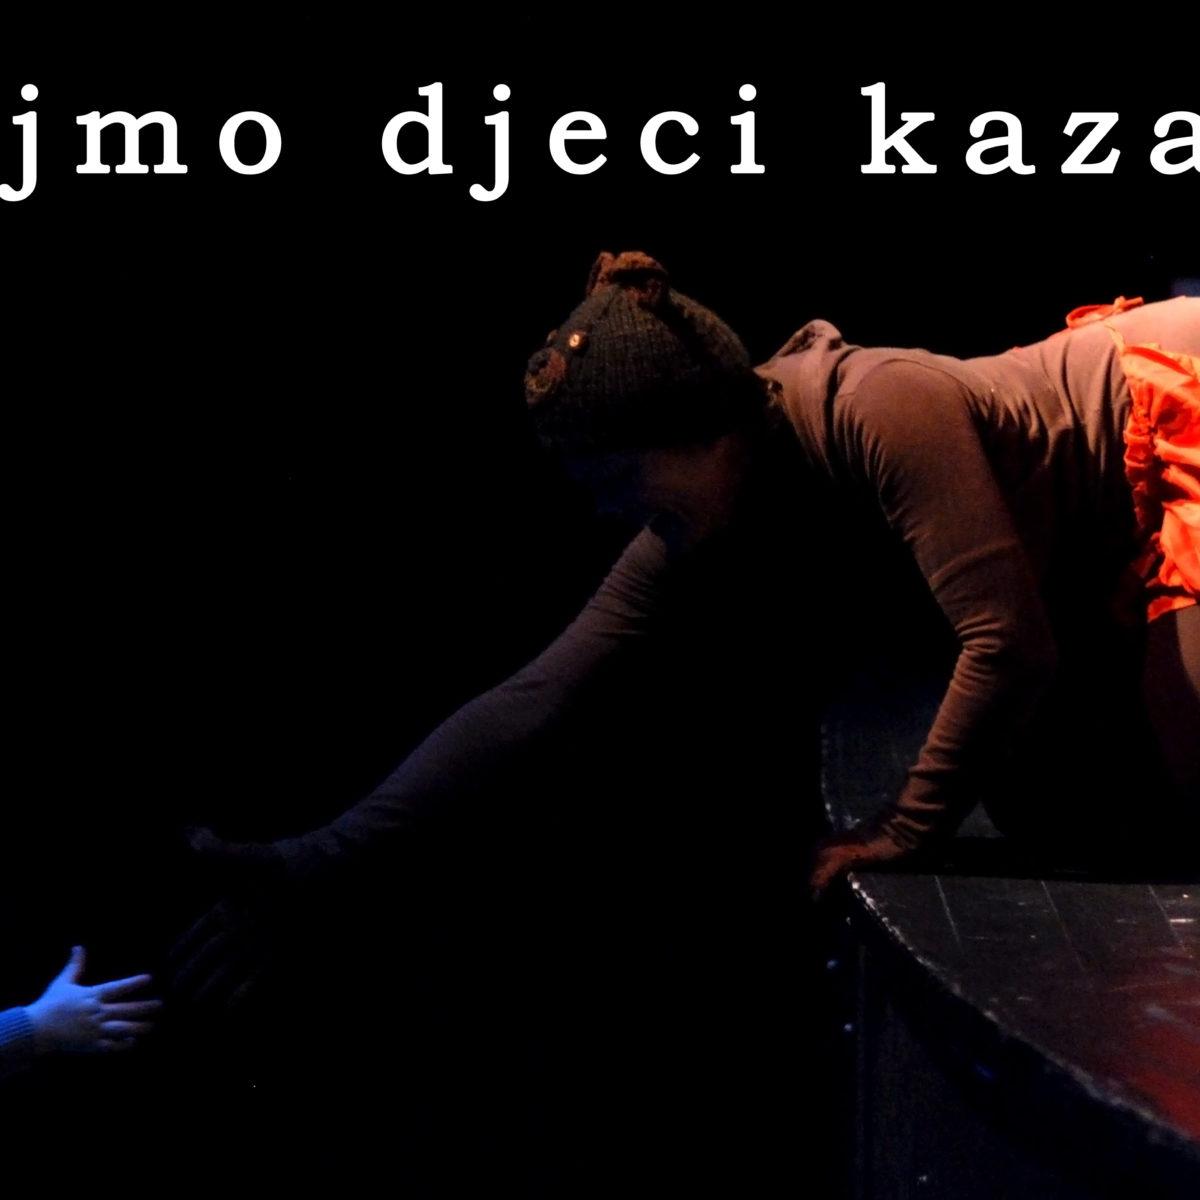 DARUJMO DJECI KAZALIŠTE: 14.4. / 10.00 DV Šegrt Hlapić / 11.30 DV Jarun